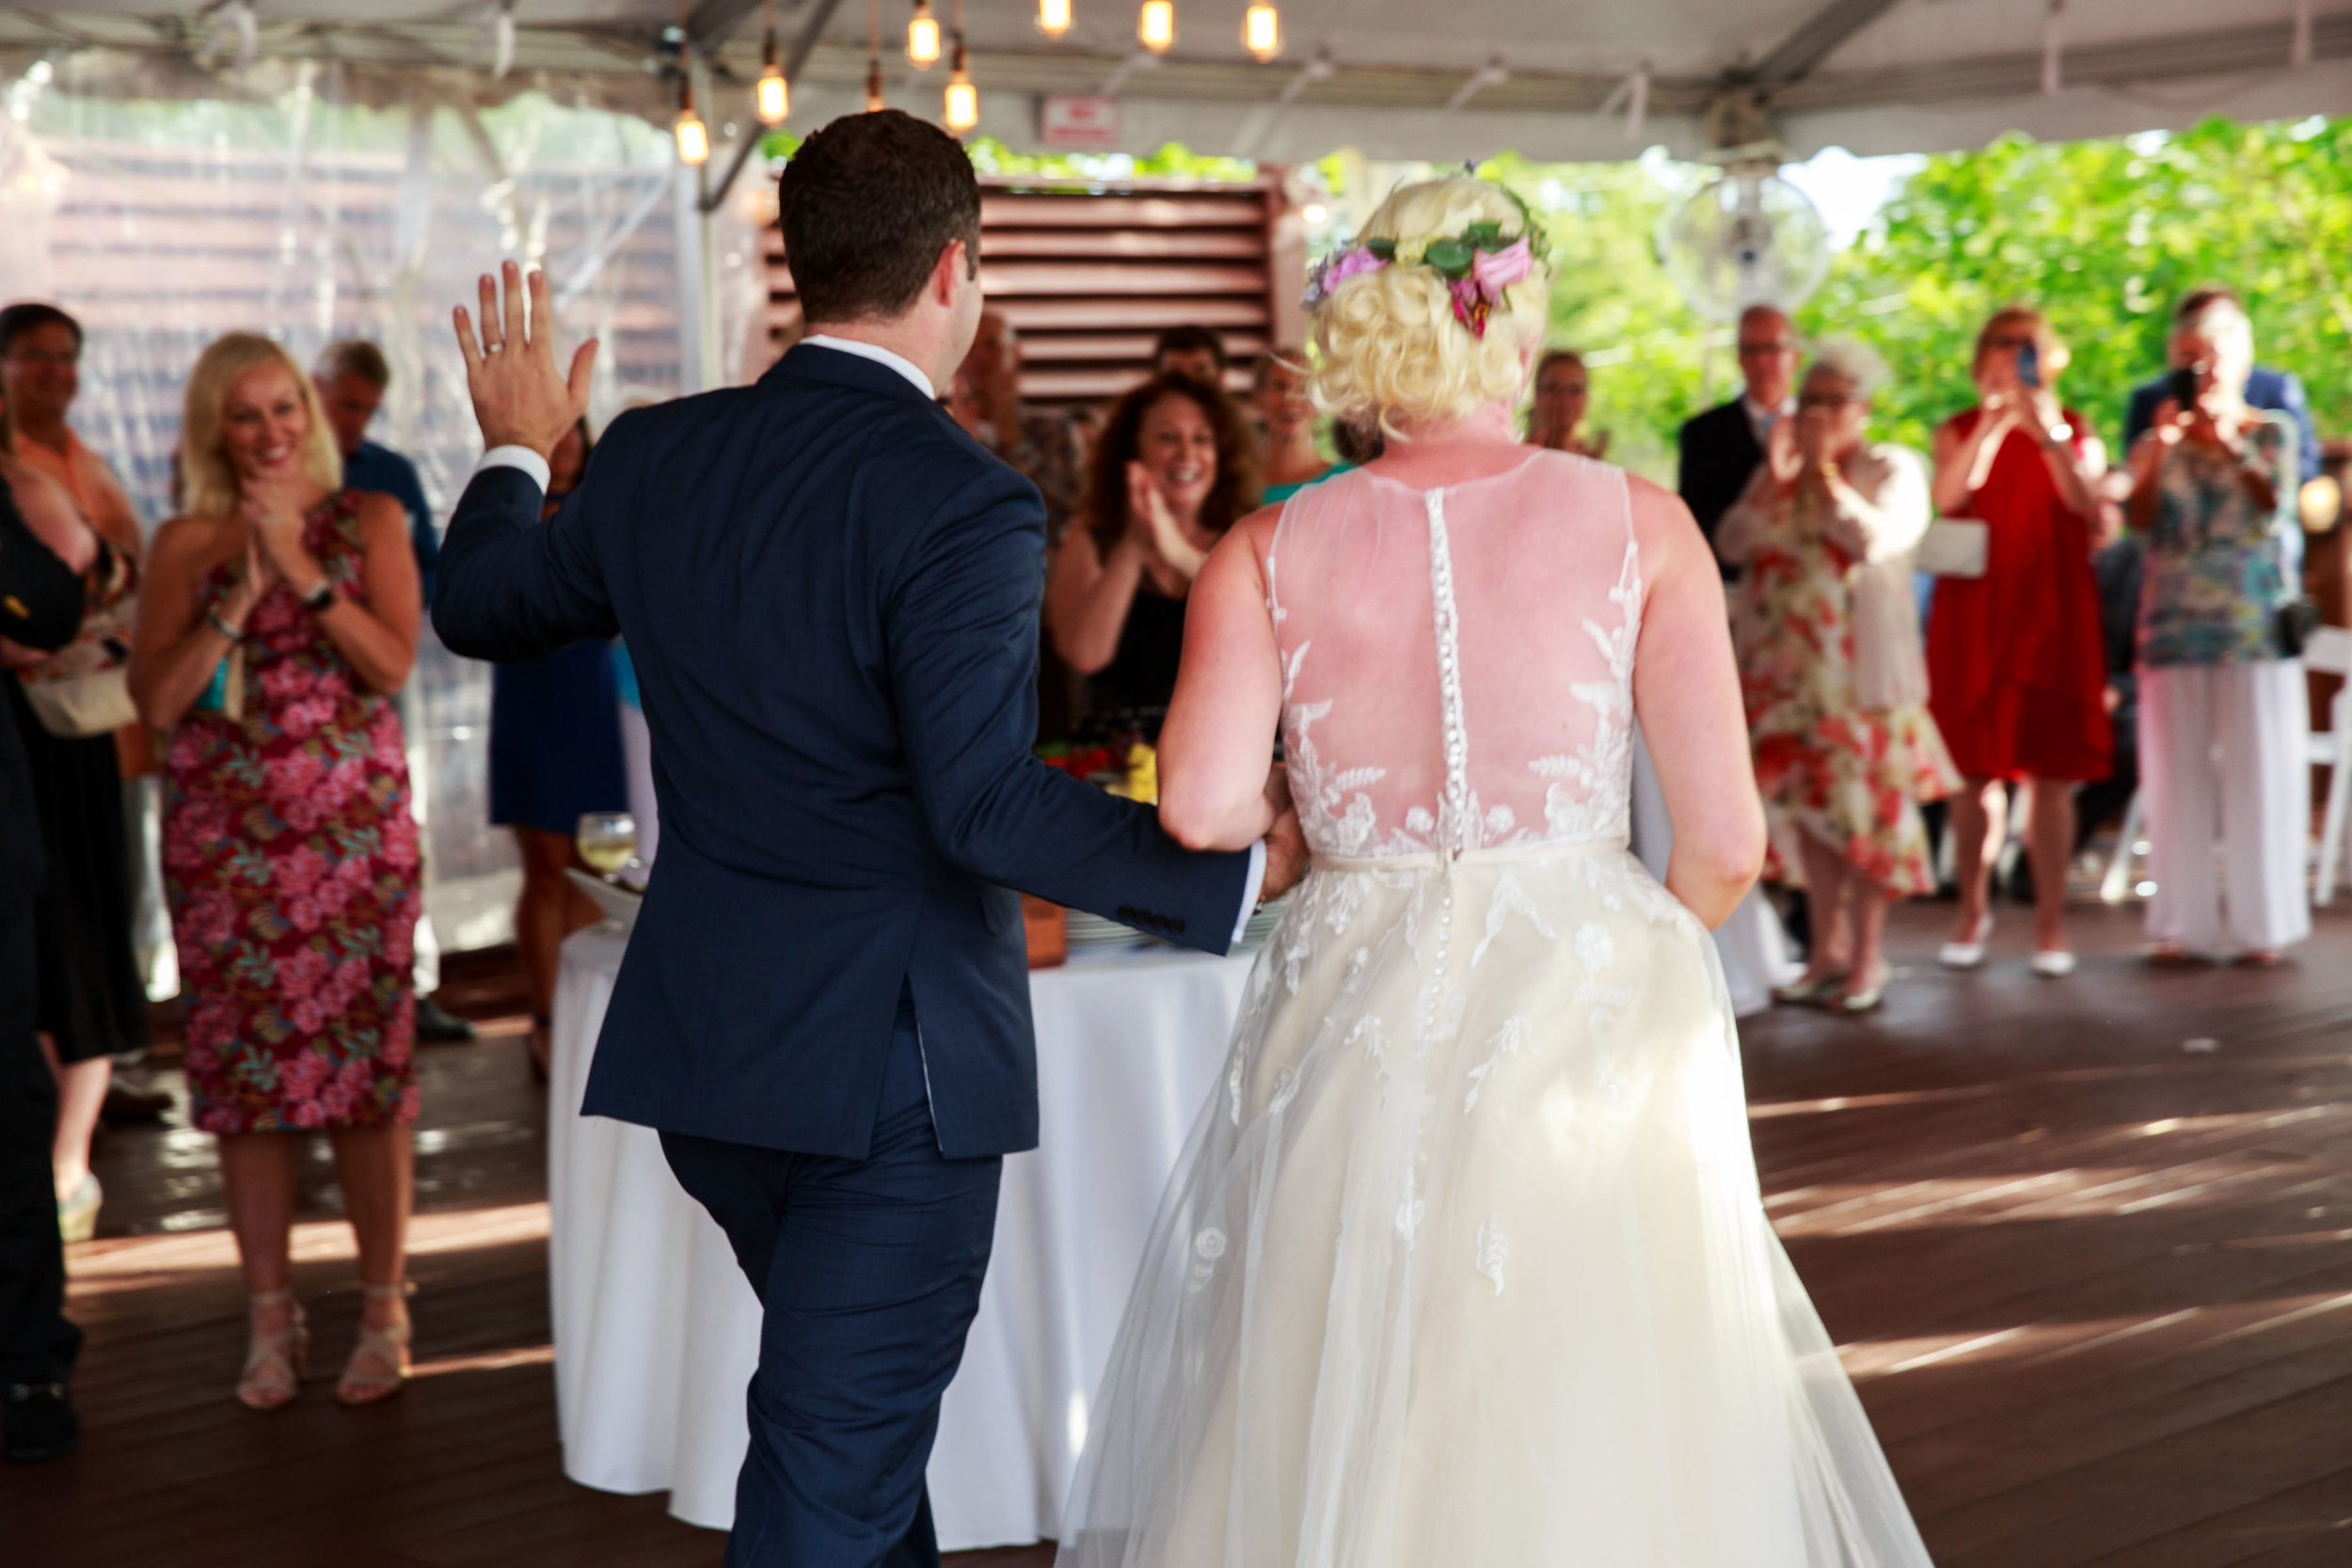 128-South-Wedding-Wilmington-NC-Photographer-Reception-14.jpg